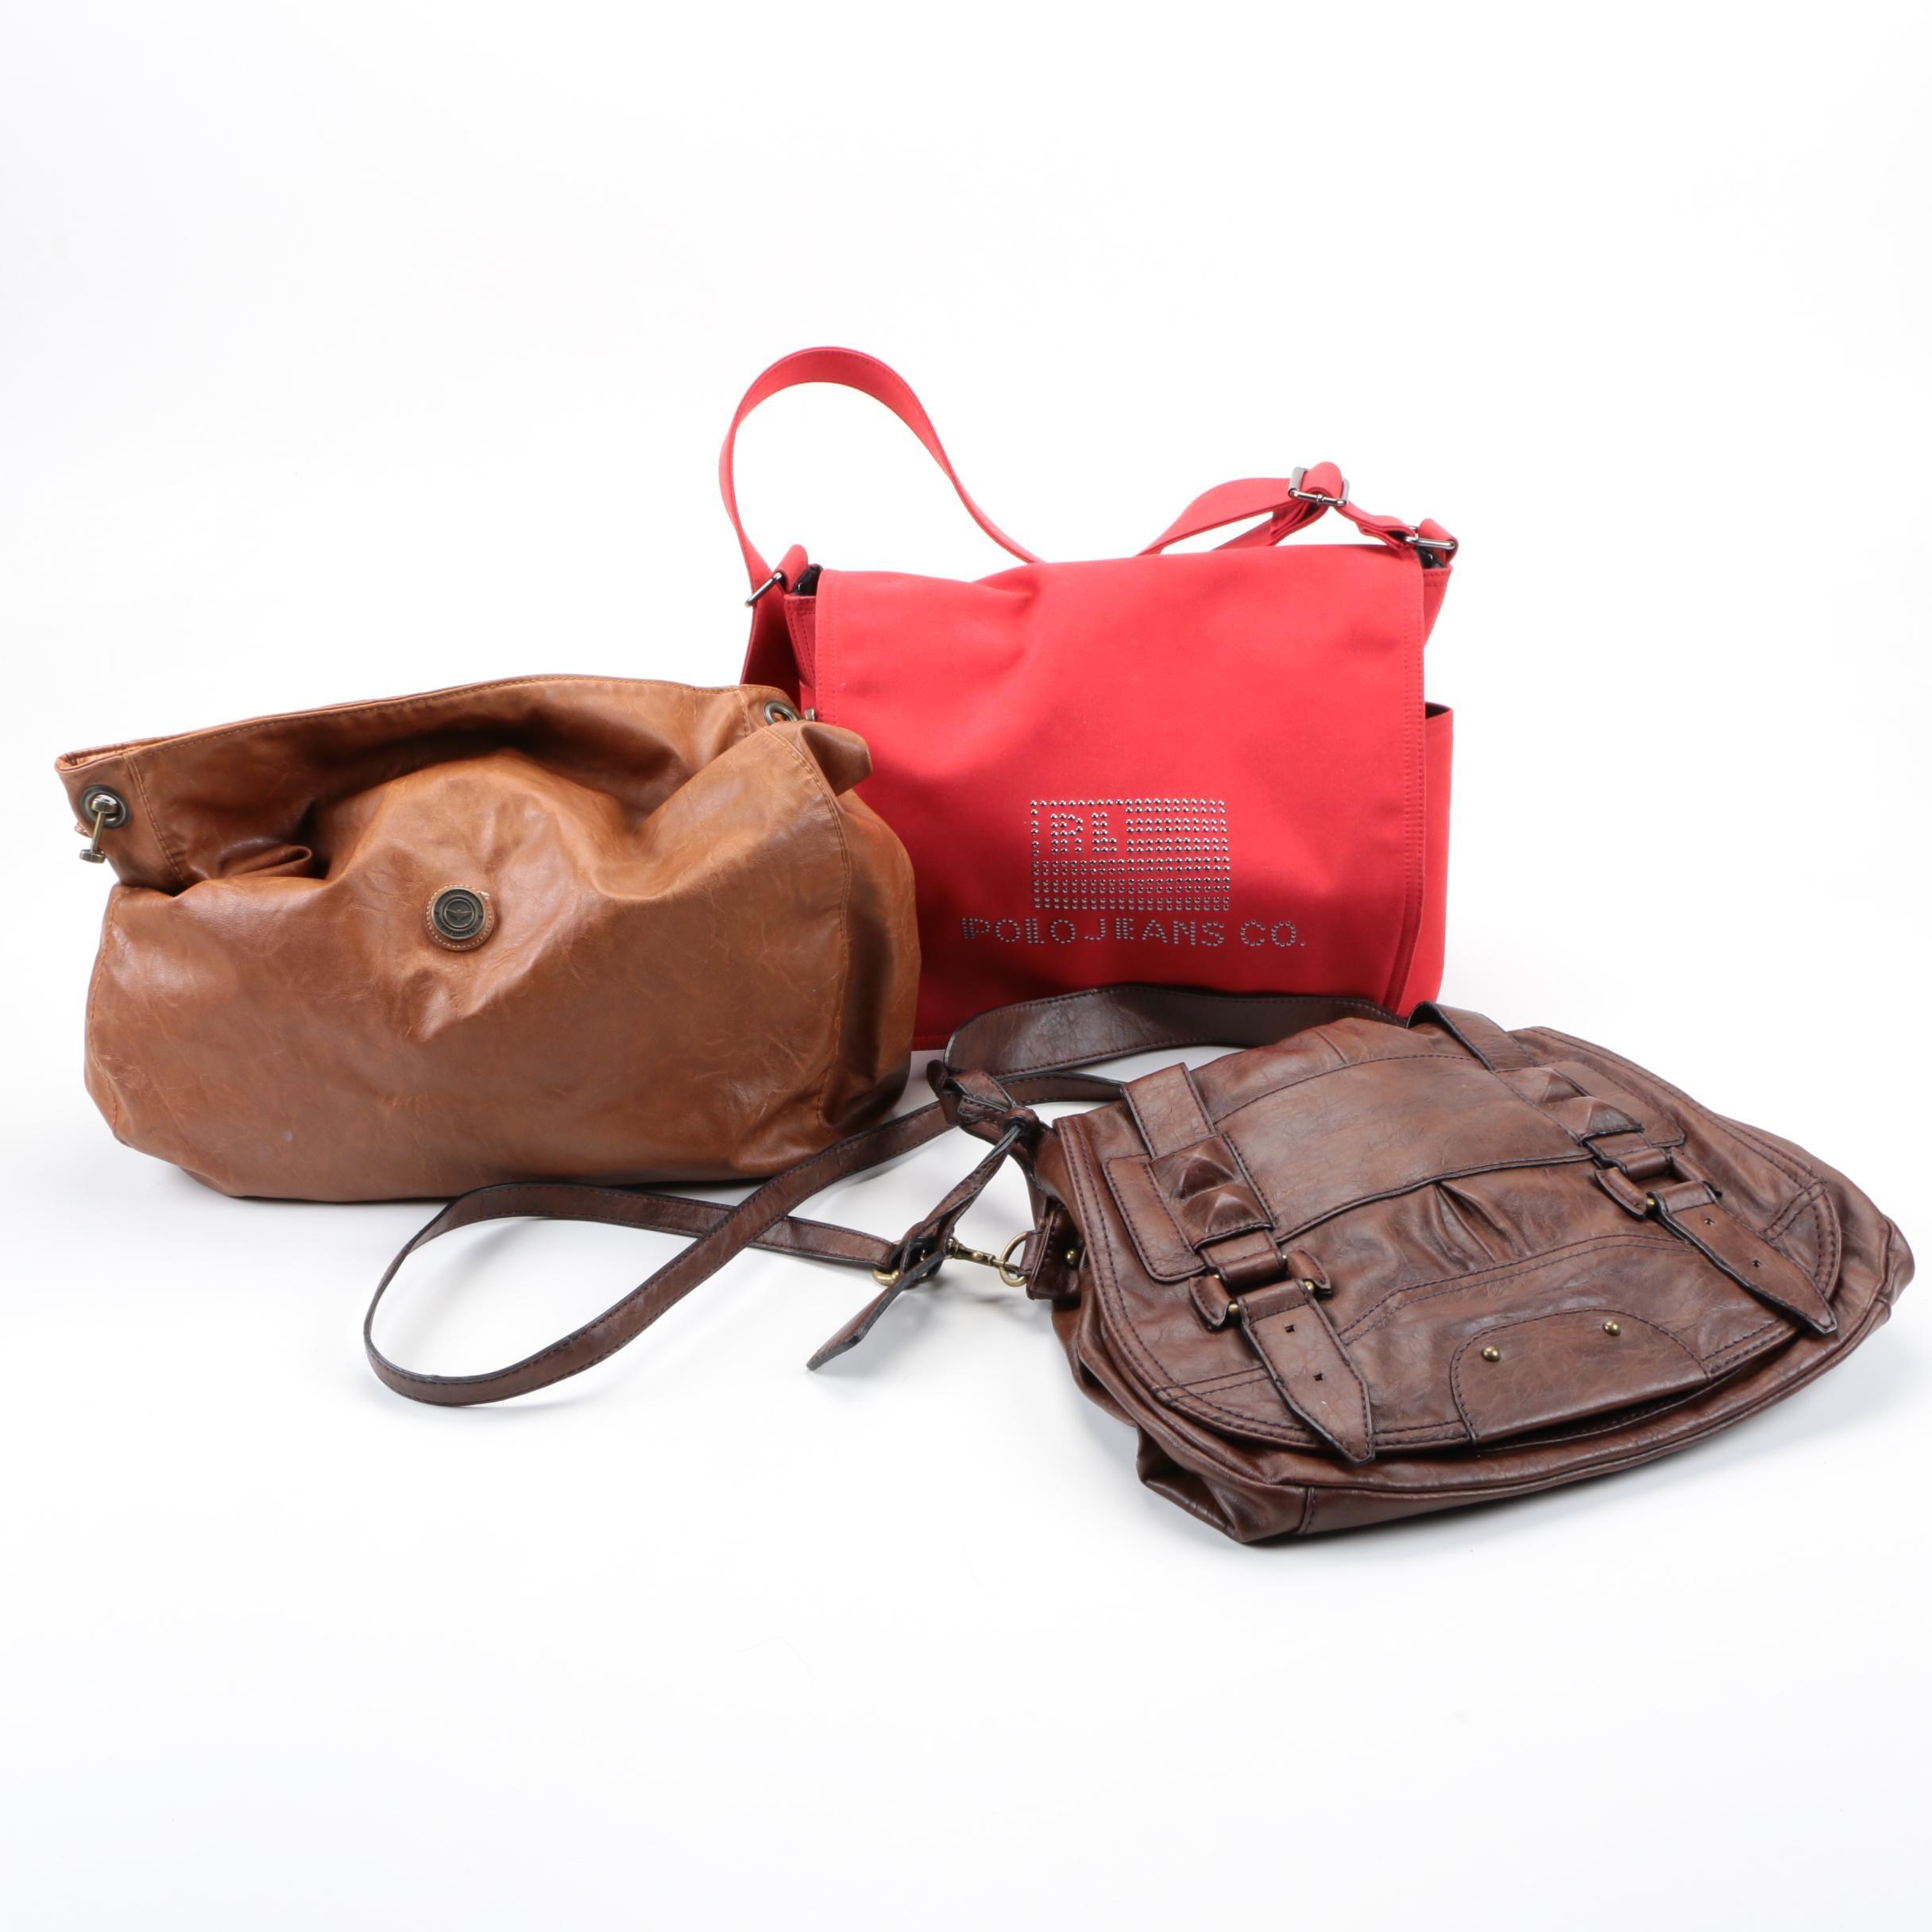 Women's Handbags Including Polo Jeans Co.